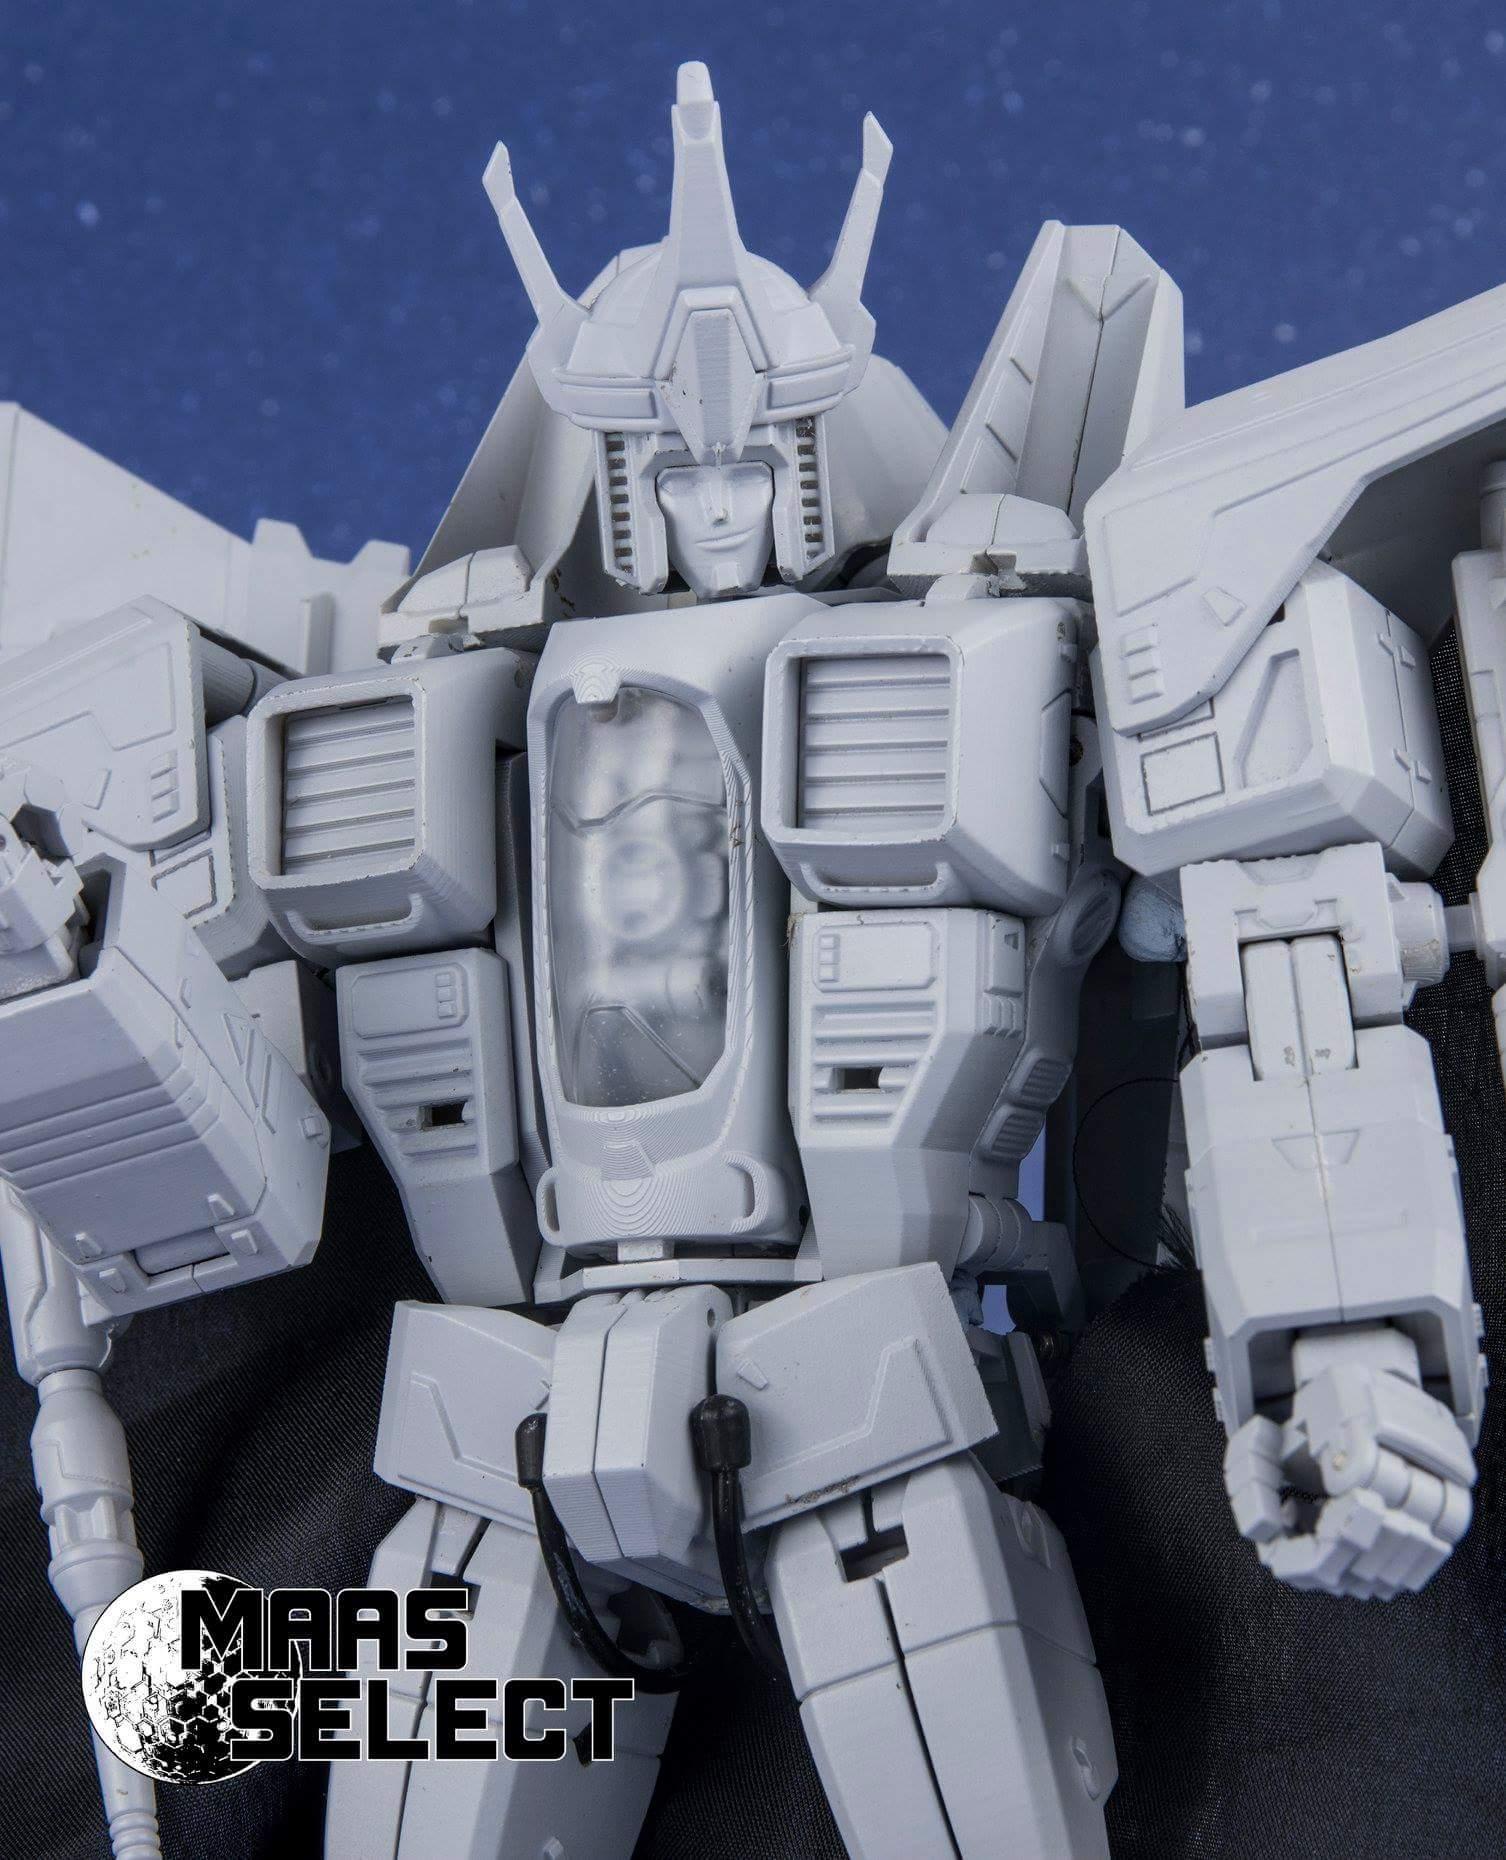 [MAAS Toys] Produit Tiers - Jouets TF de la gamme Cybertech Series (mode Cybertronien) + Gee Too (G2) - Page 2 I2ydO8yM_o